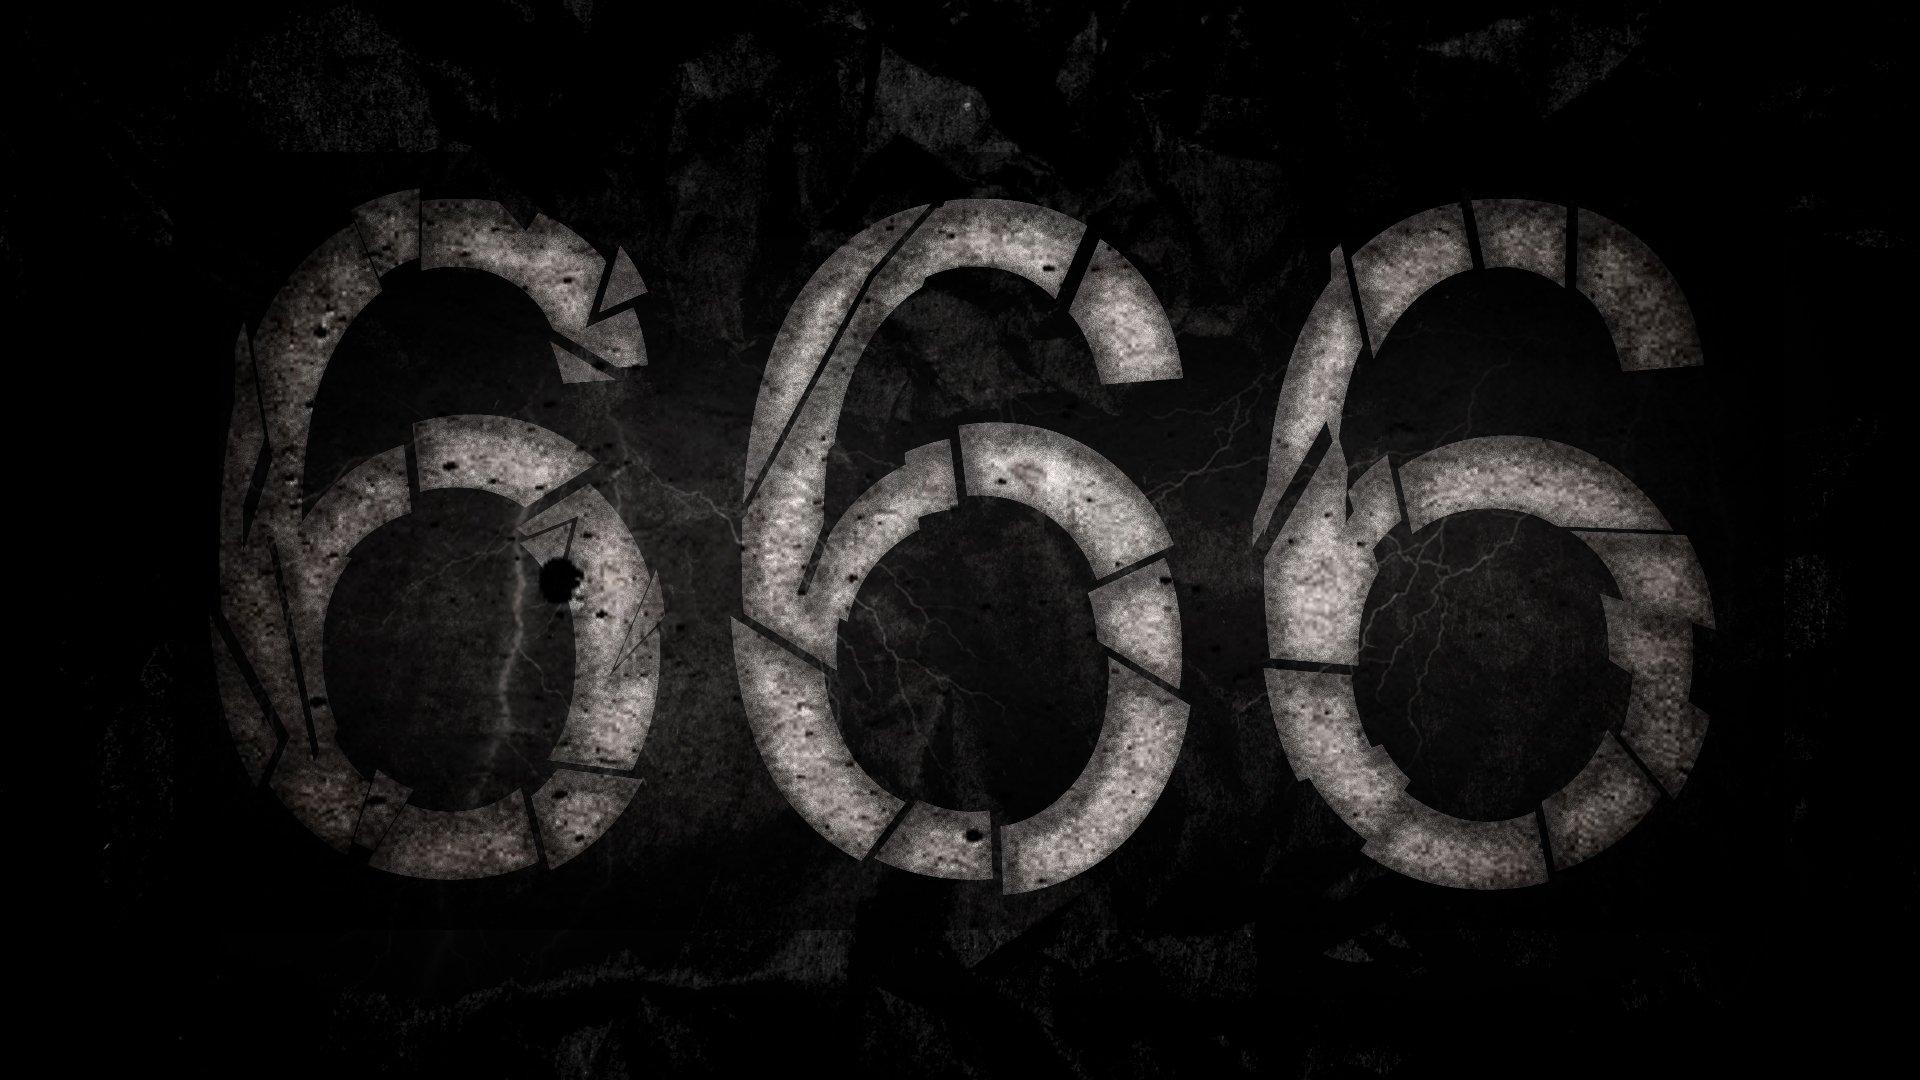 occult satan satanic 666 evil wallpaper background 1920x1080